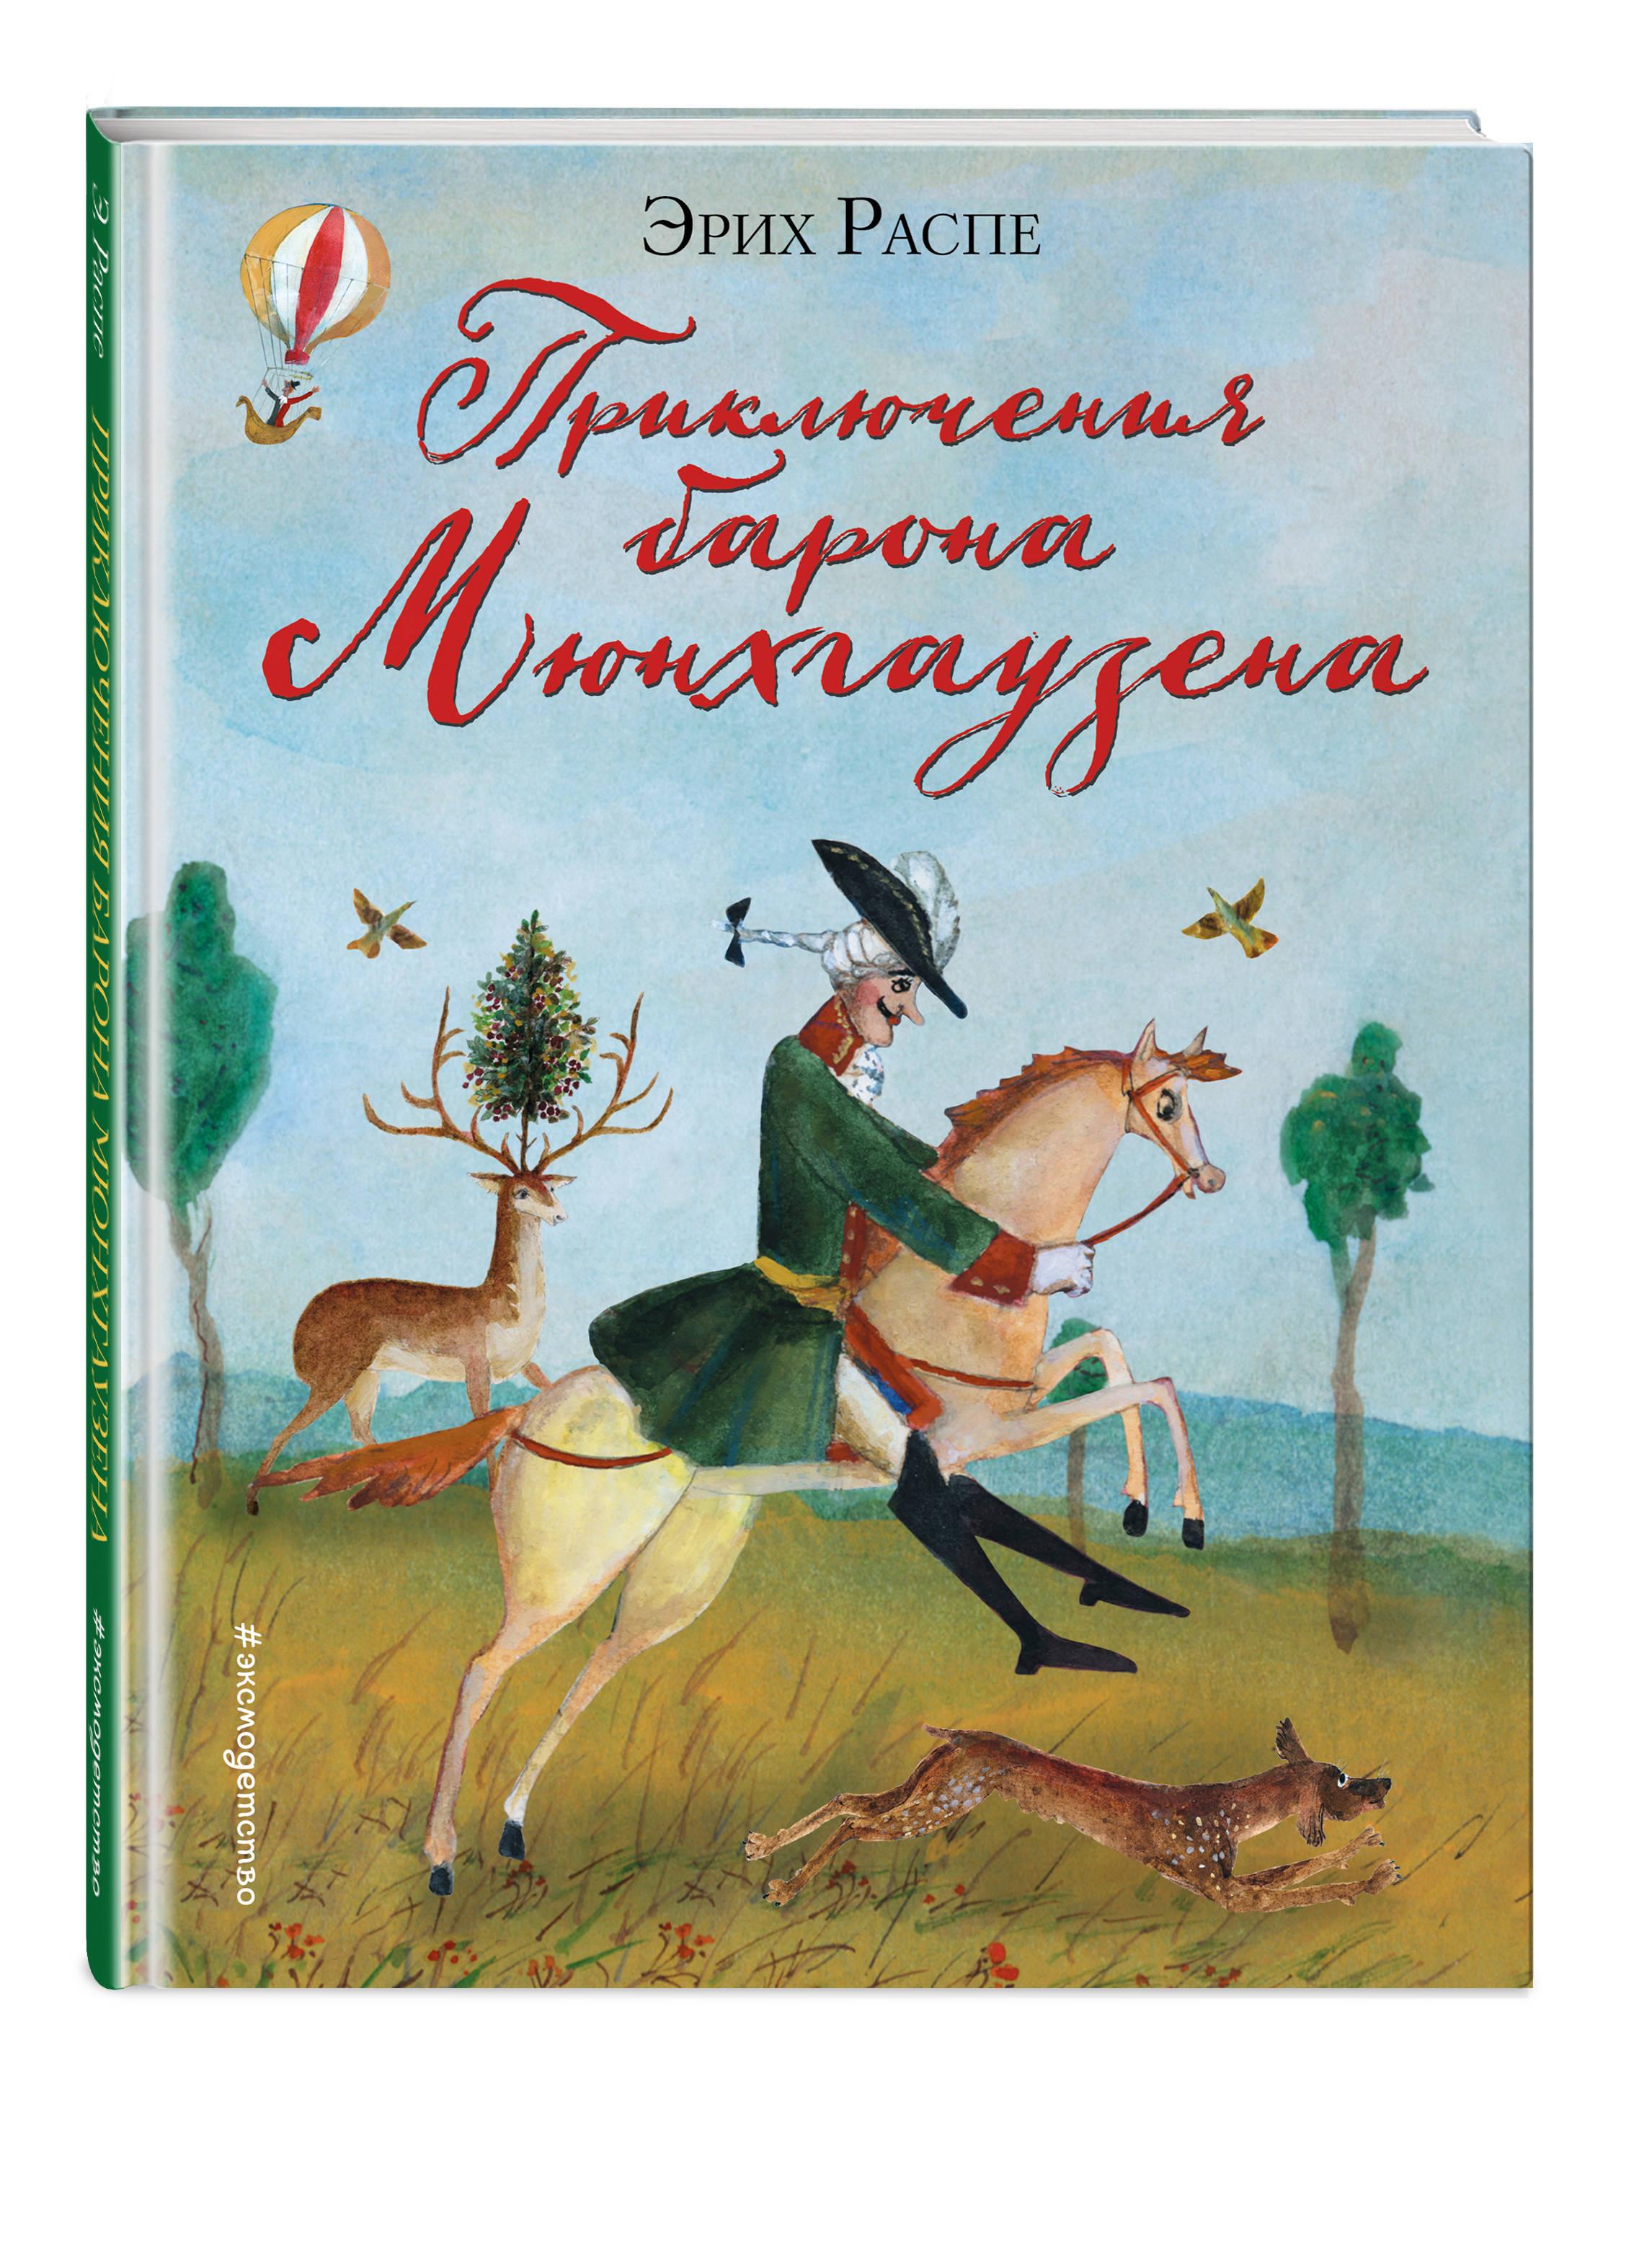 Распе Р. Э. Приключения барона Мюнхгаузена (ил. М. Федорова) ISBN: 978-5-699-82333-8